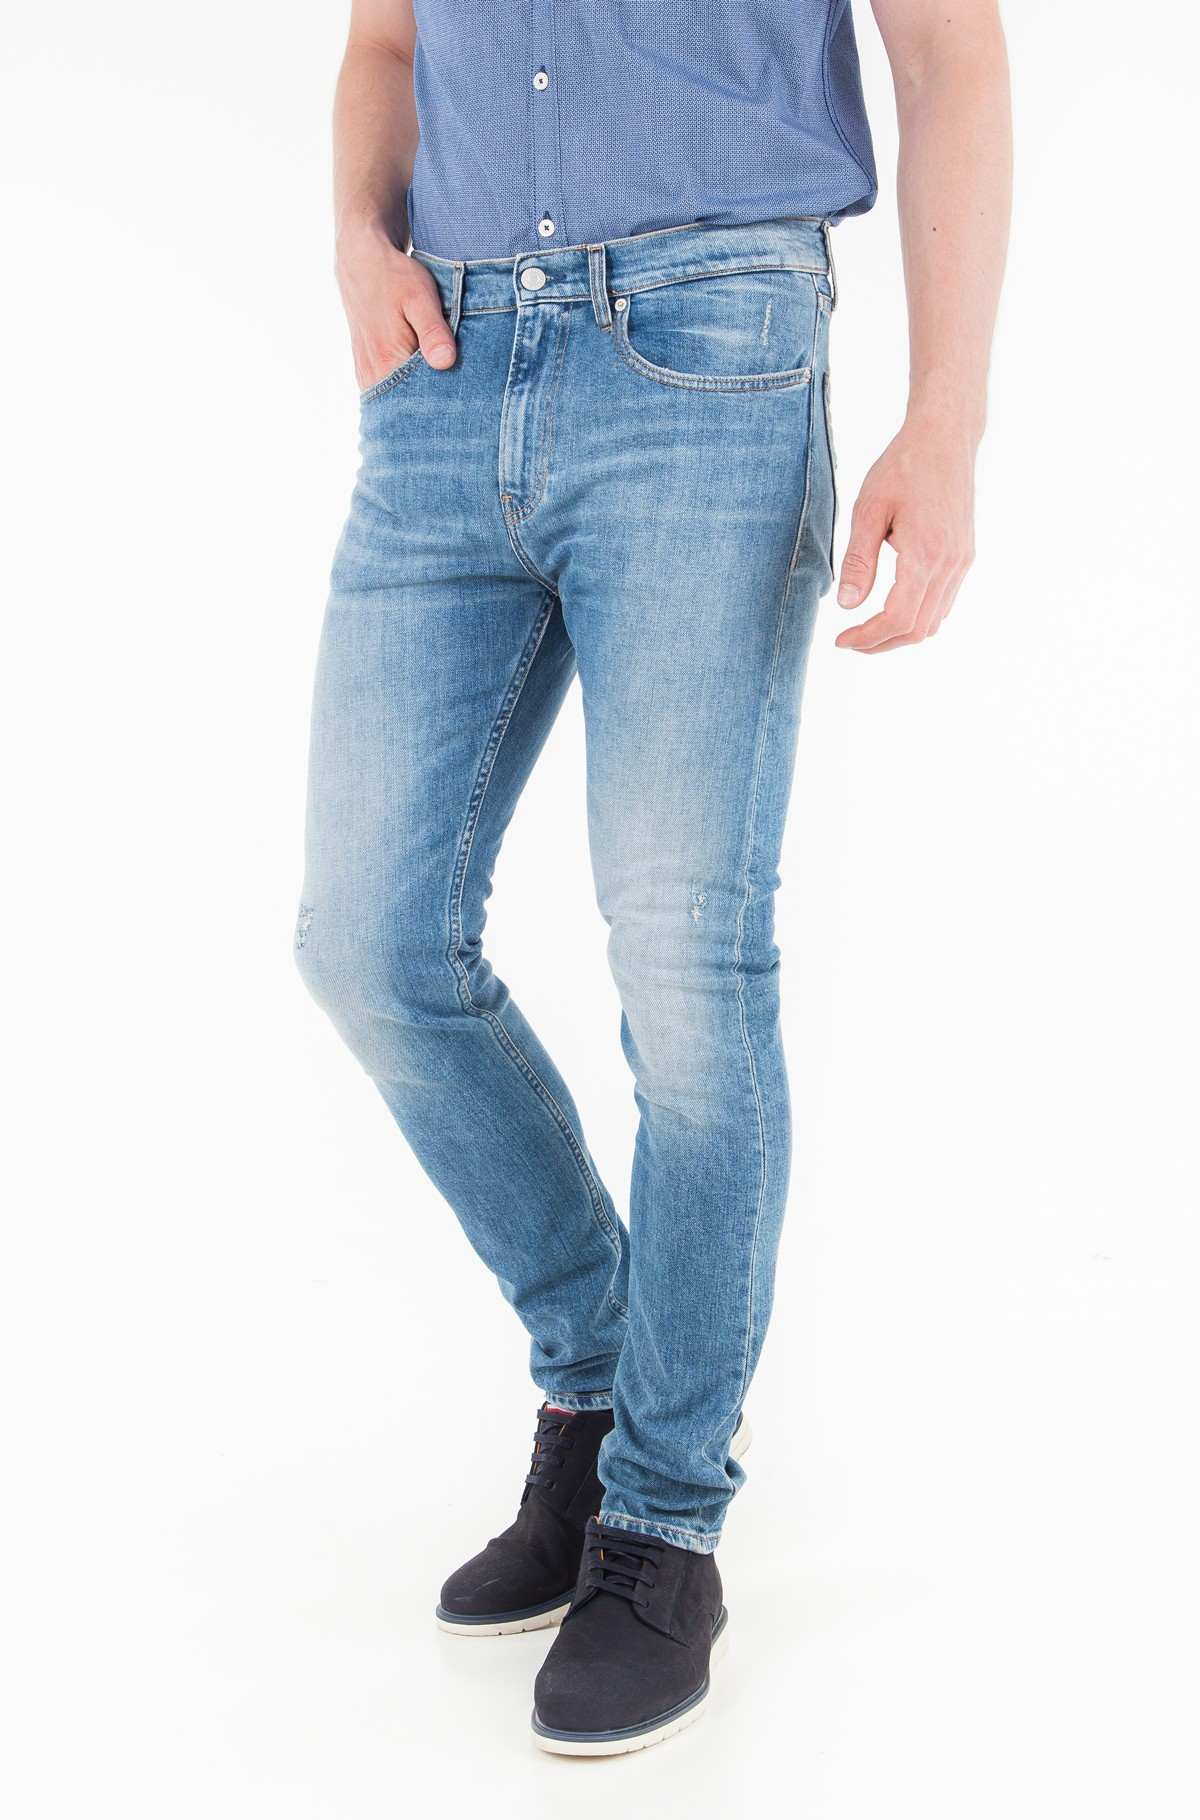 Jeans CKJ 016: Skinny West-full-1